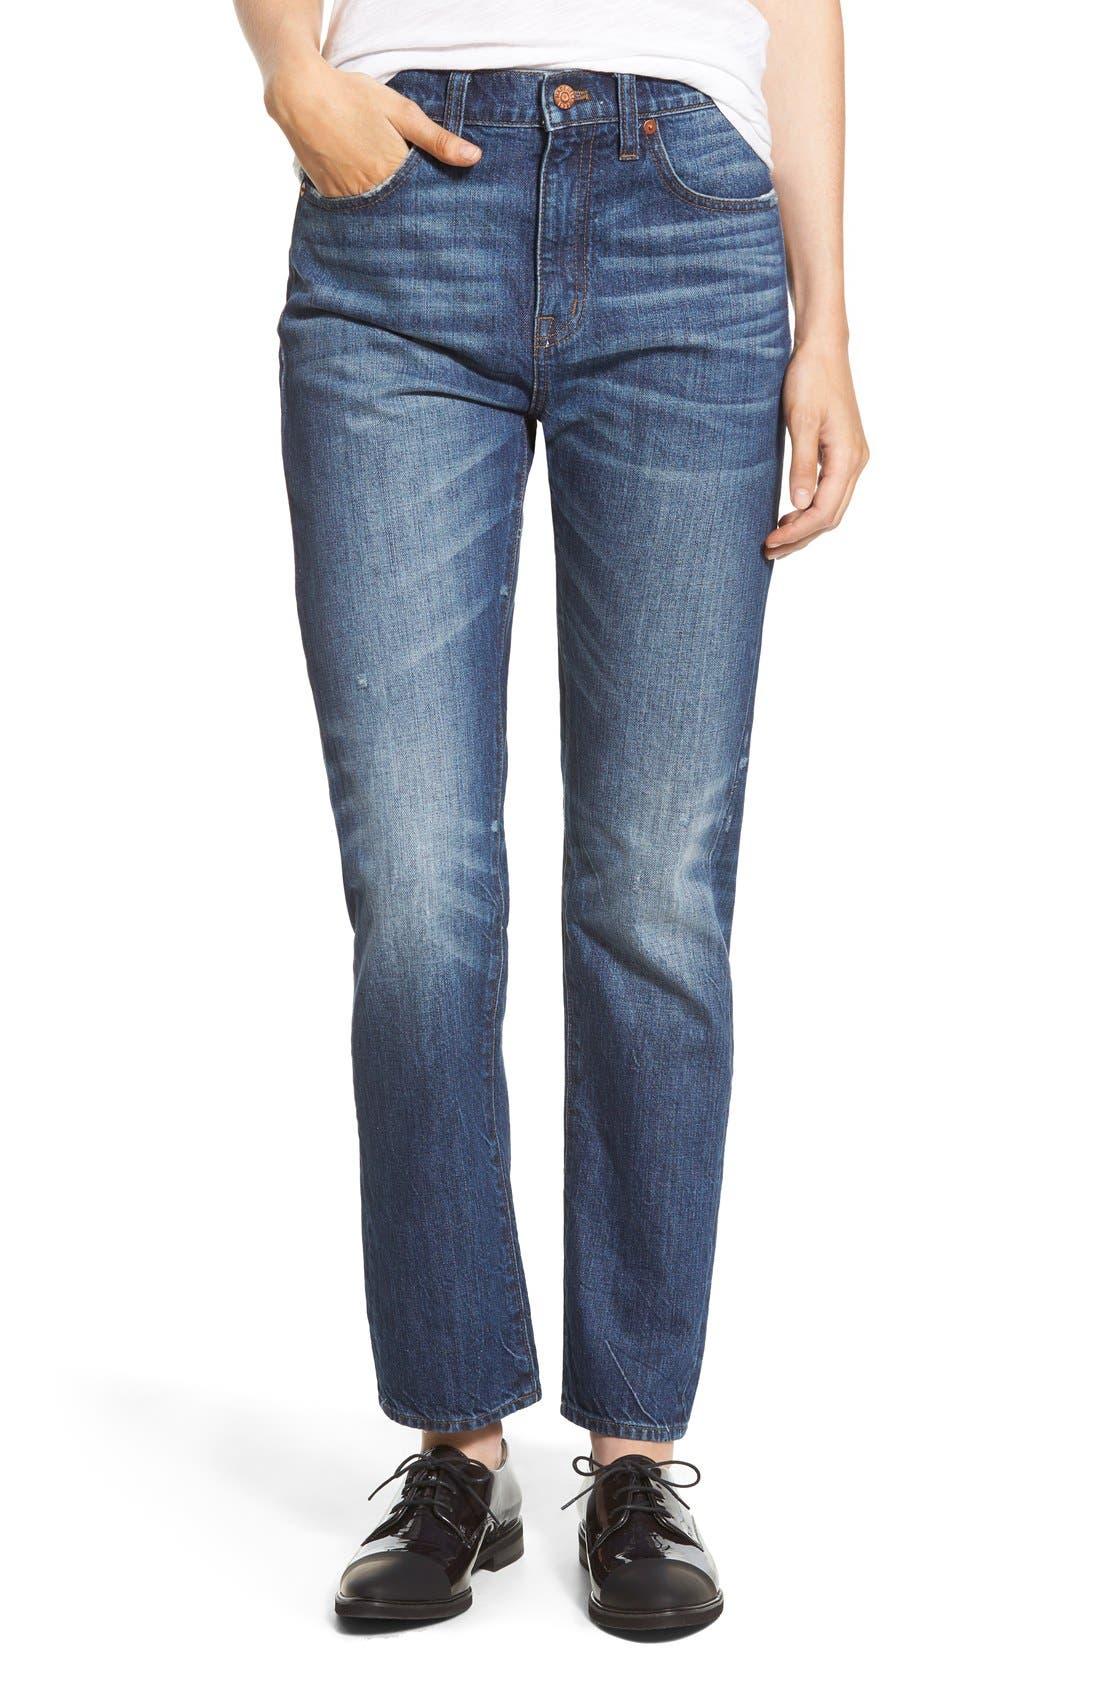 Alternate Image 1 Selected - Madewell Crop Straight Leg Jeans (Preston)